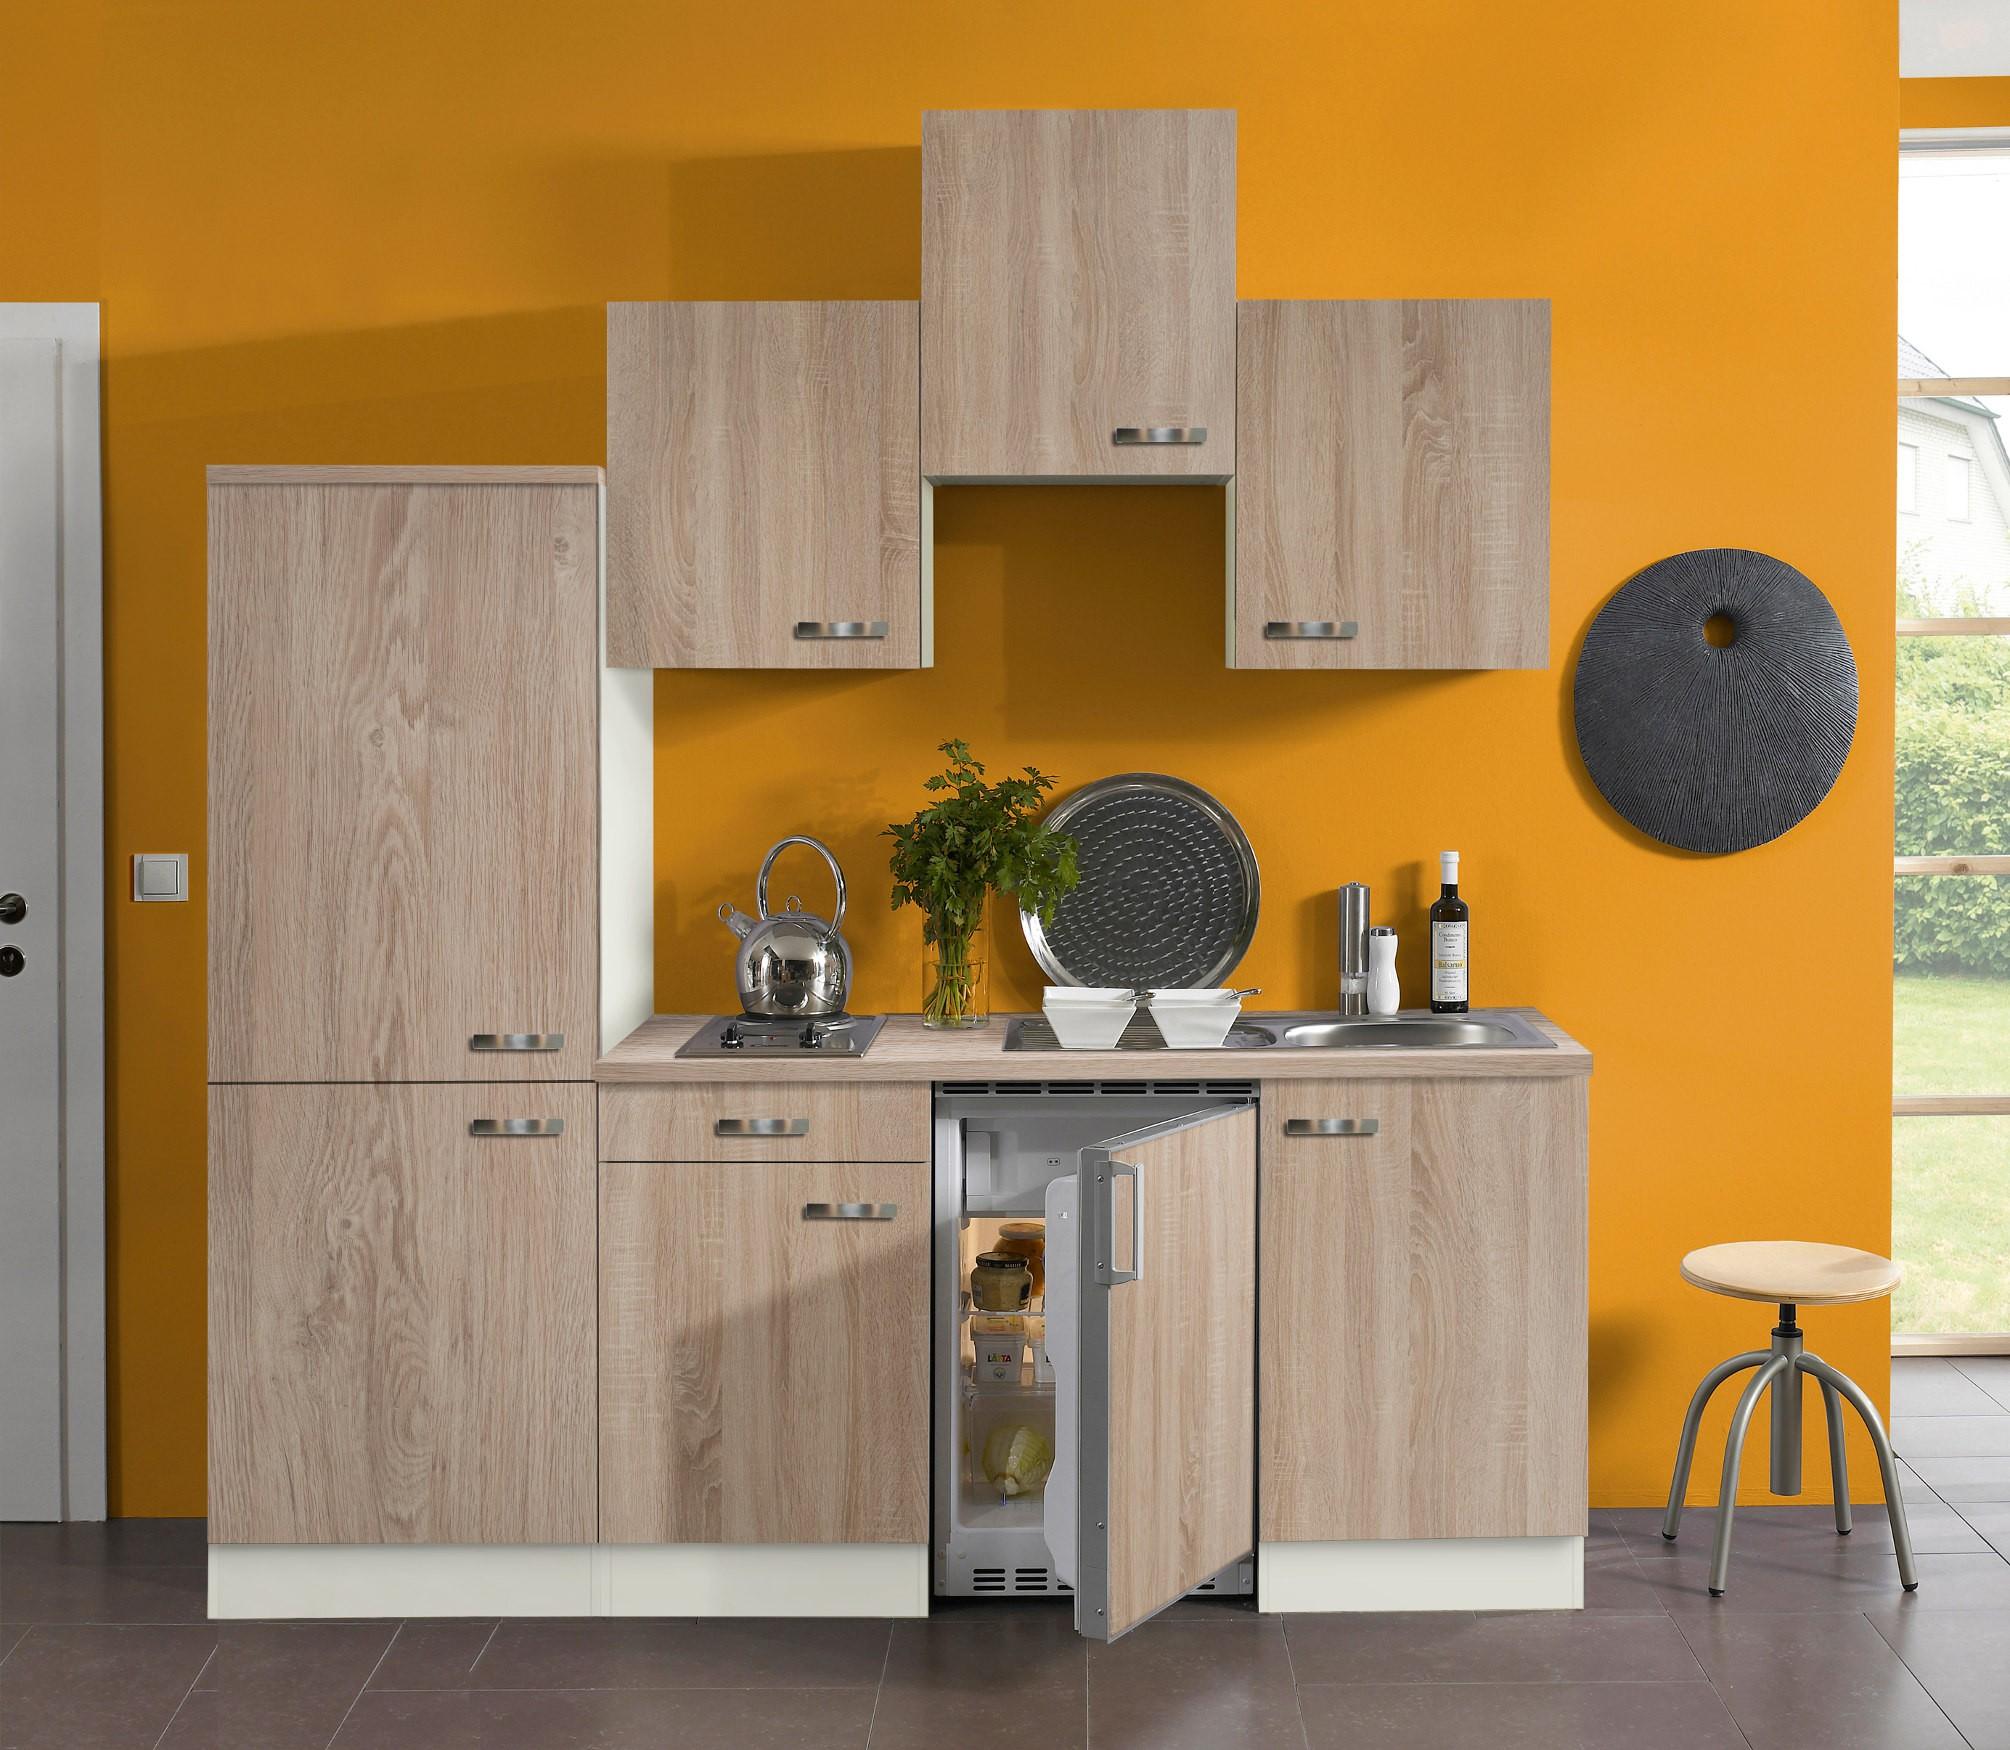 singlek che toledo vario 1 mit elektro kochfeld. Black Bedroom Furniture Sets. Home Design Ideas